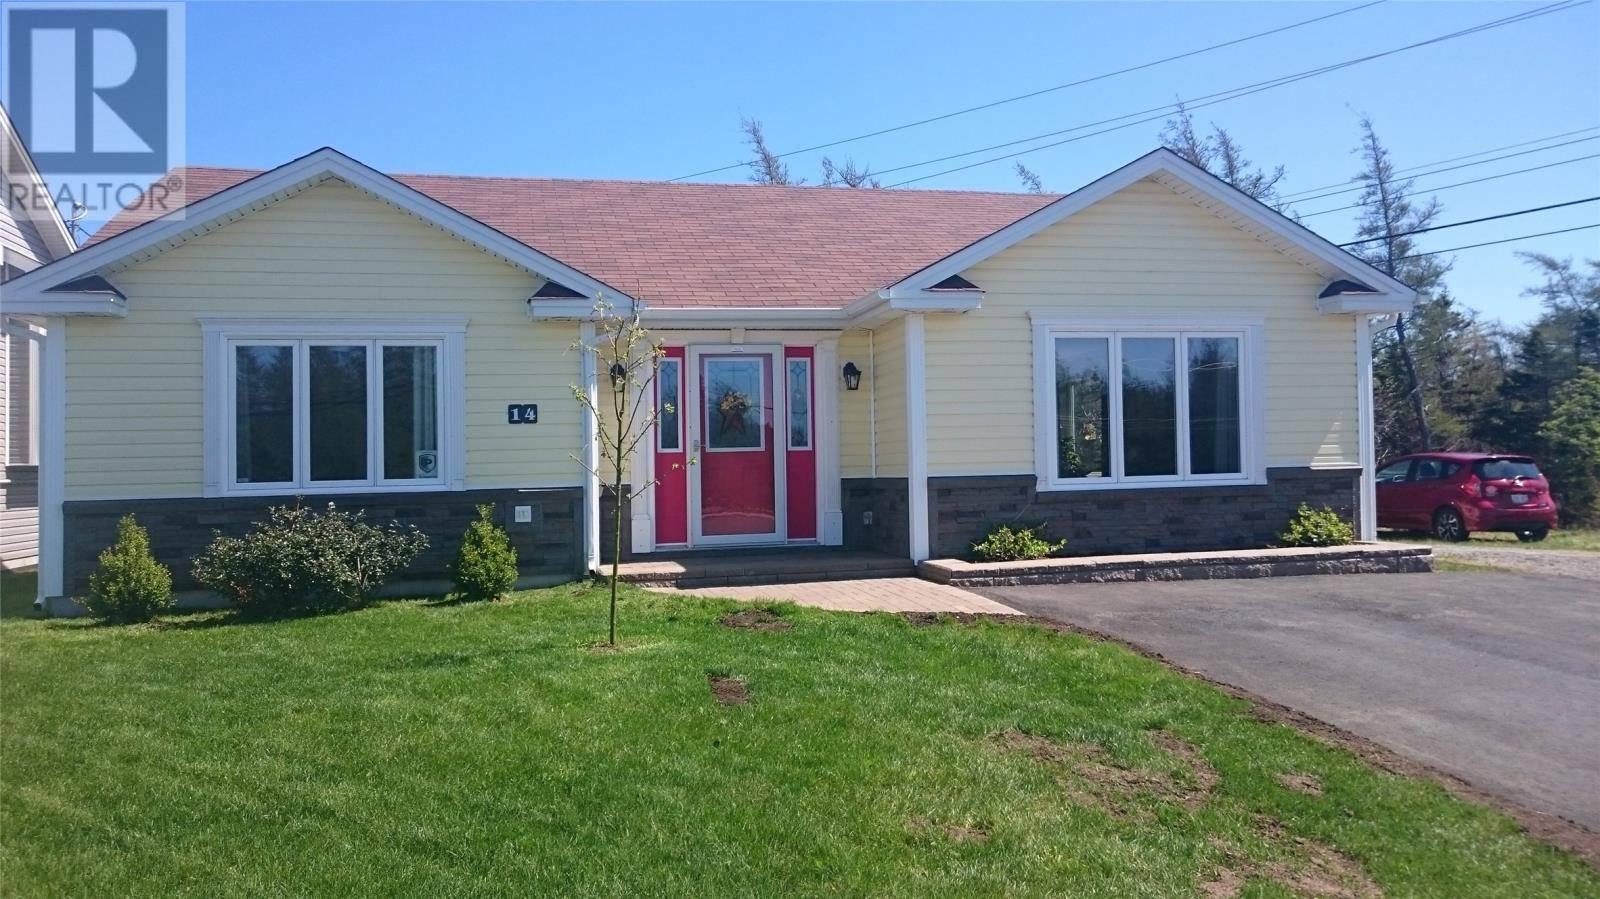 House for sale at 14 Castle Bridge Dr St. John's Newfoundland - MLS: 1200791